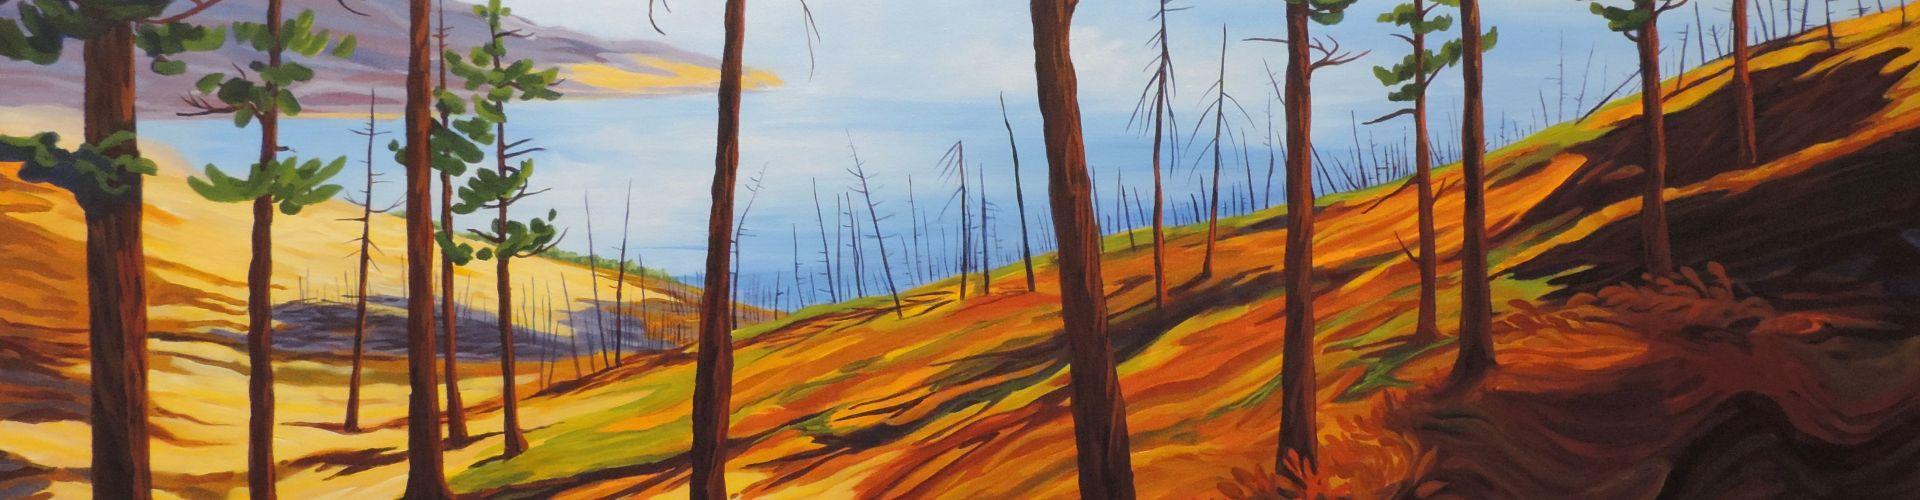 Acrylic paint of the Goats Peak by Linda Lovisa.